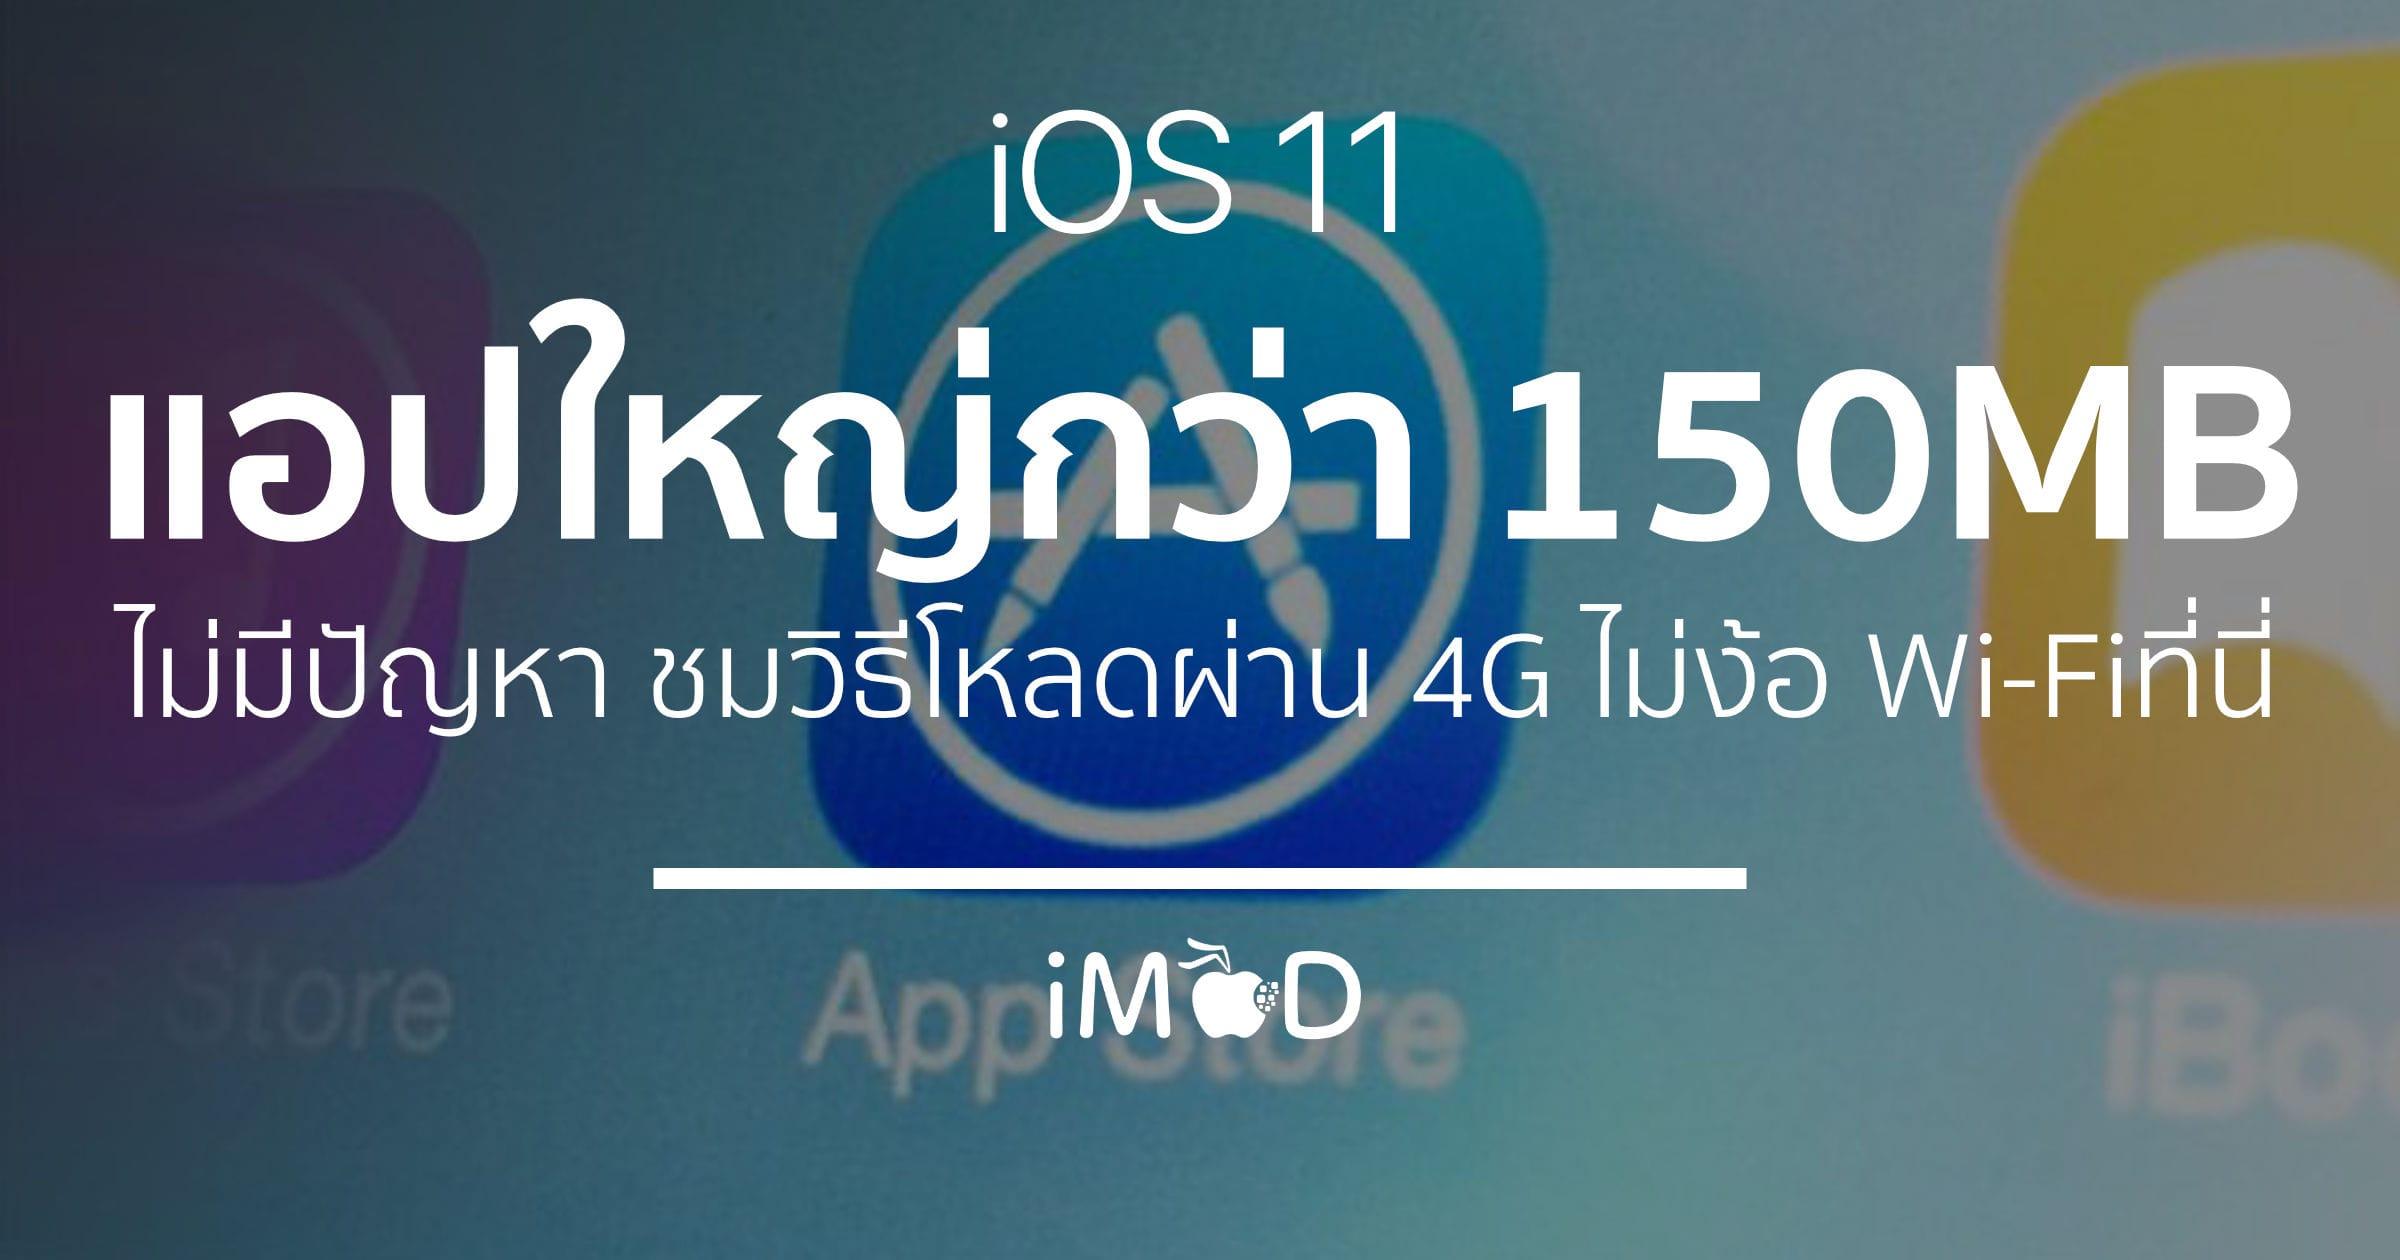 Ios 11 Download App Bigger Than 150mb Over Cellular